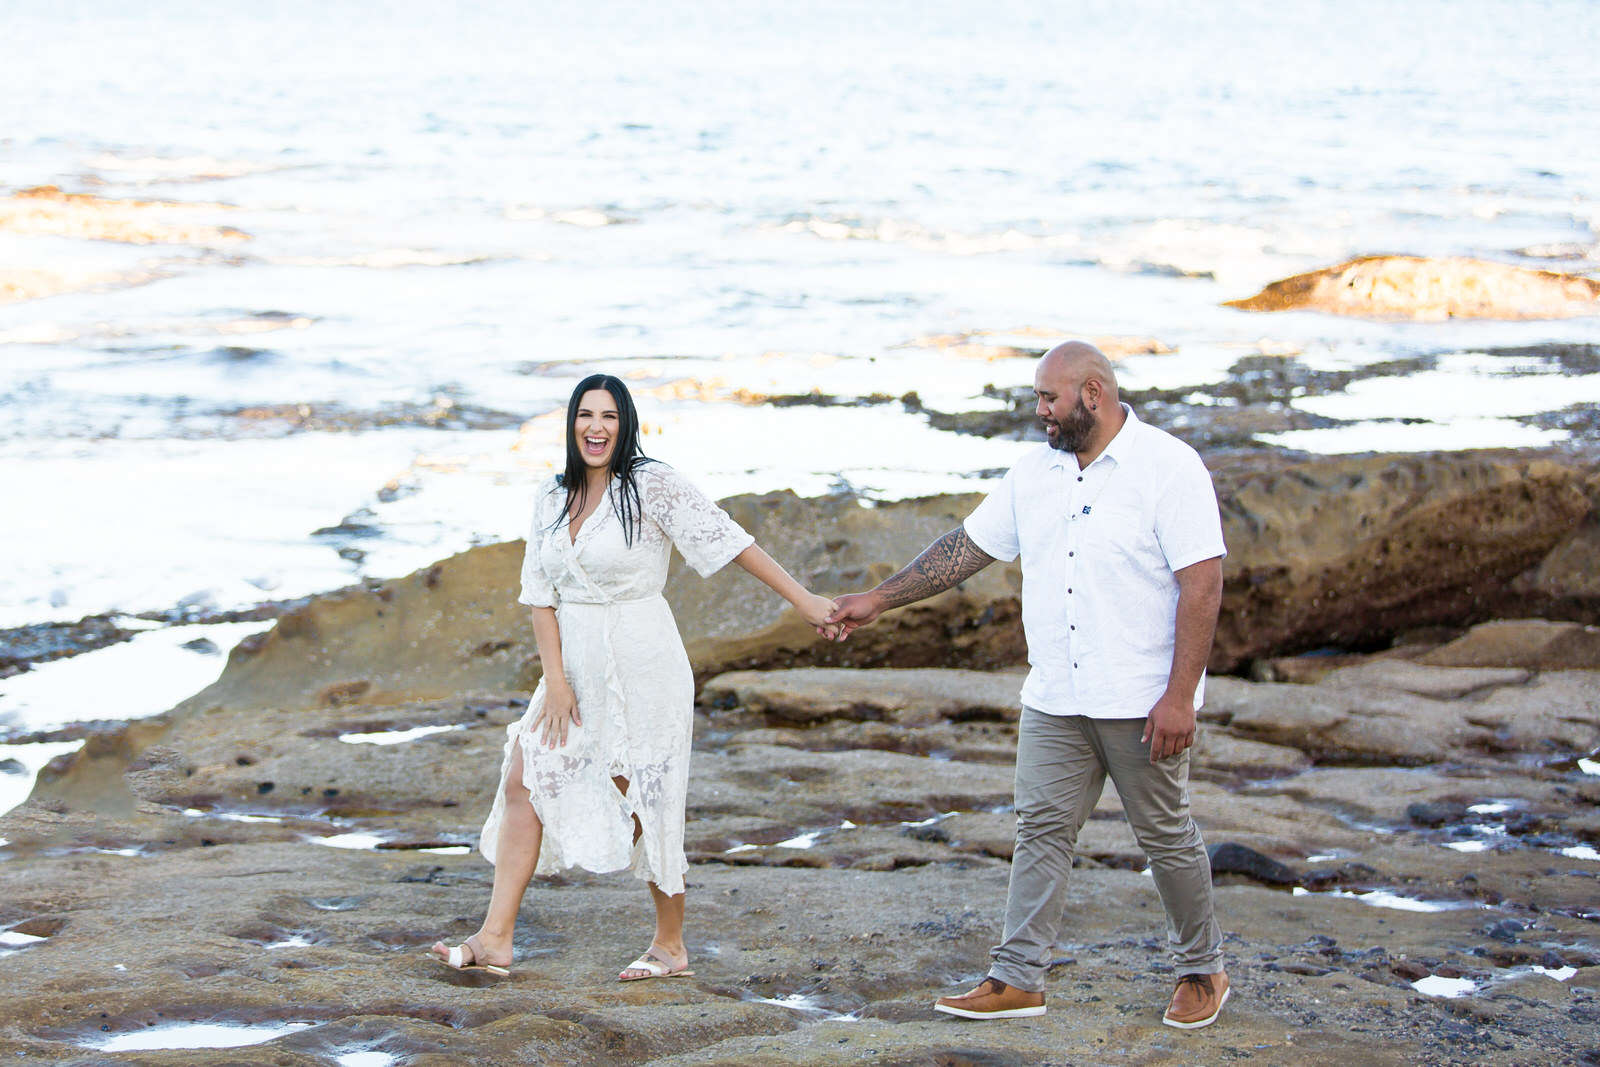 Sydney Wedding Photographer - Maroubra Beach - Jennifer Lam Photography (13).jpg